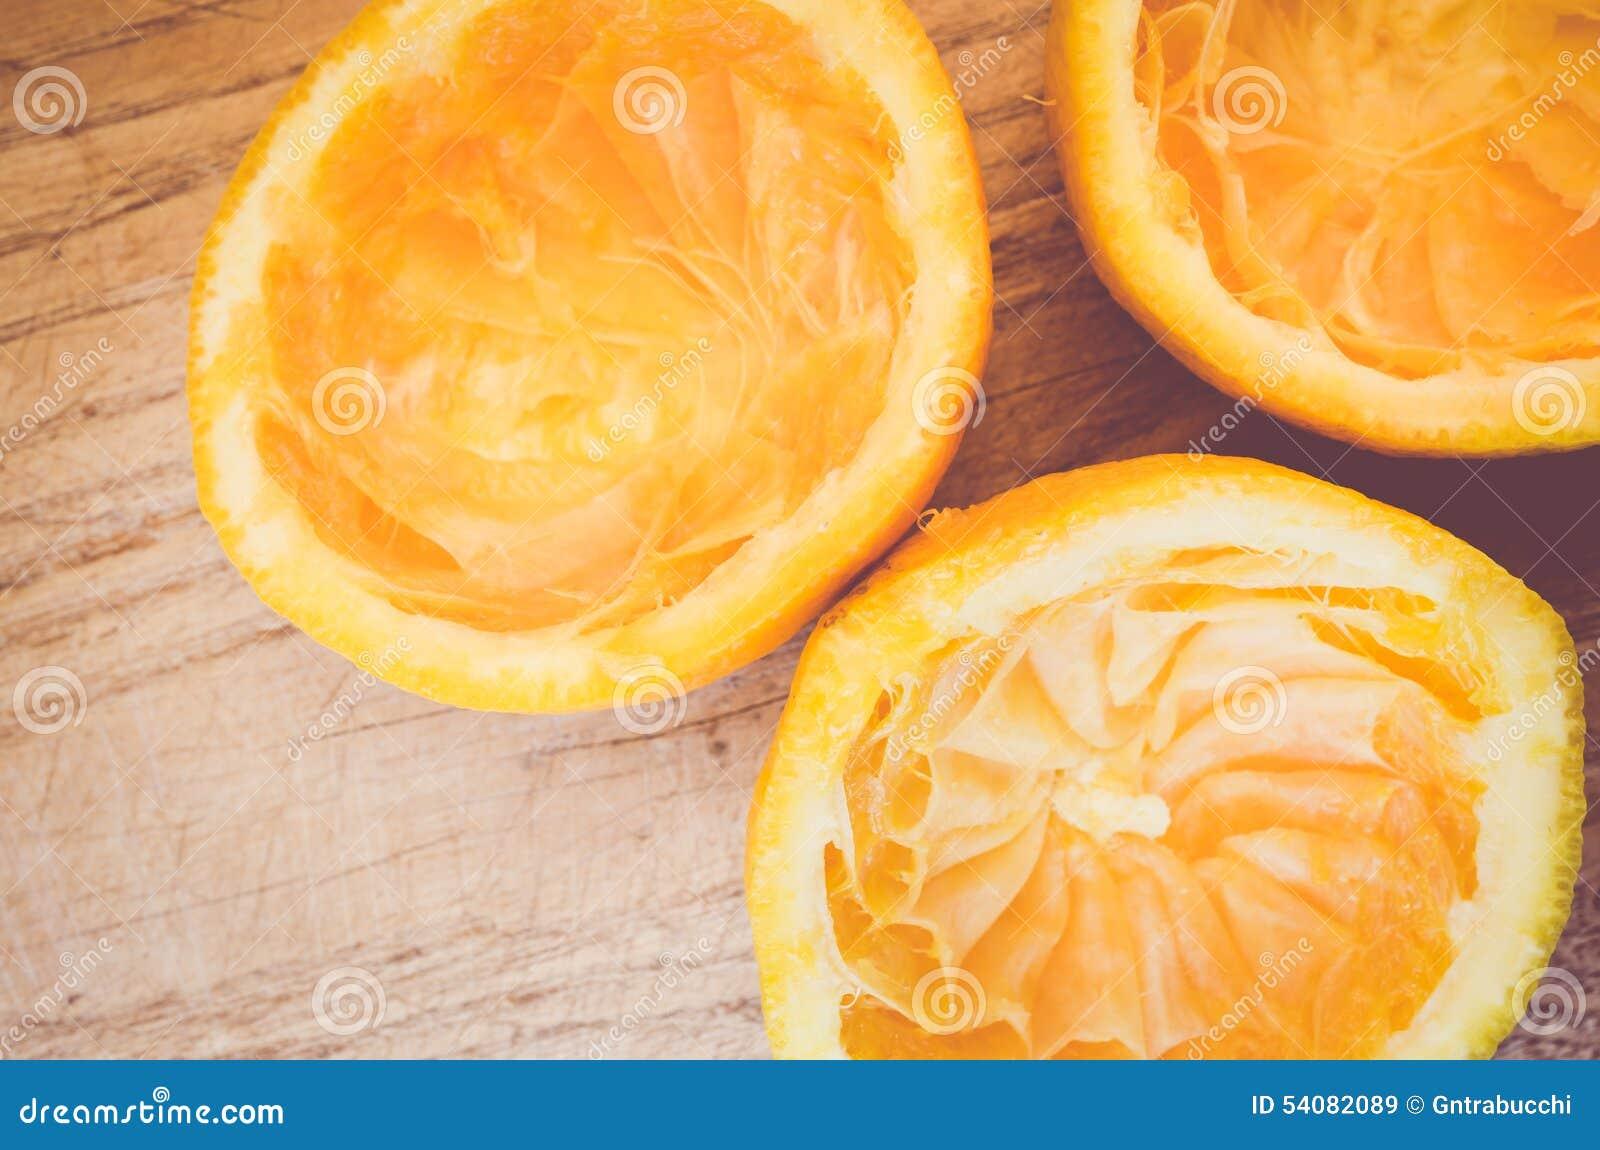 Halve besnoeiing gedrukte sinaasappelen